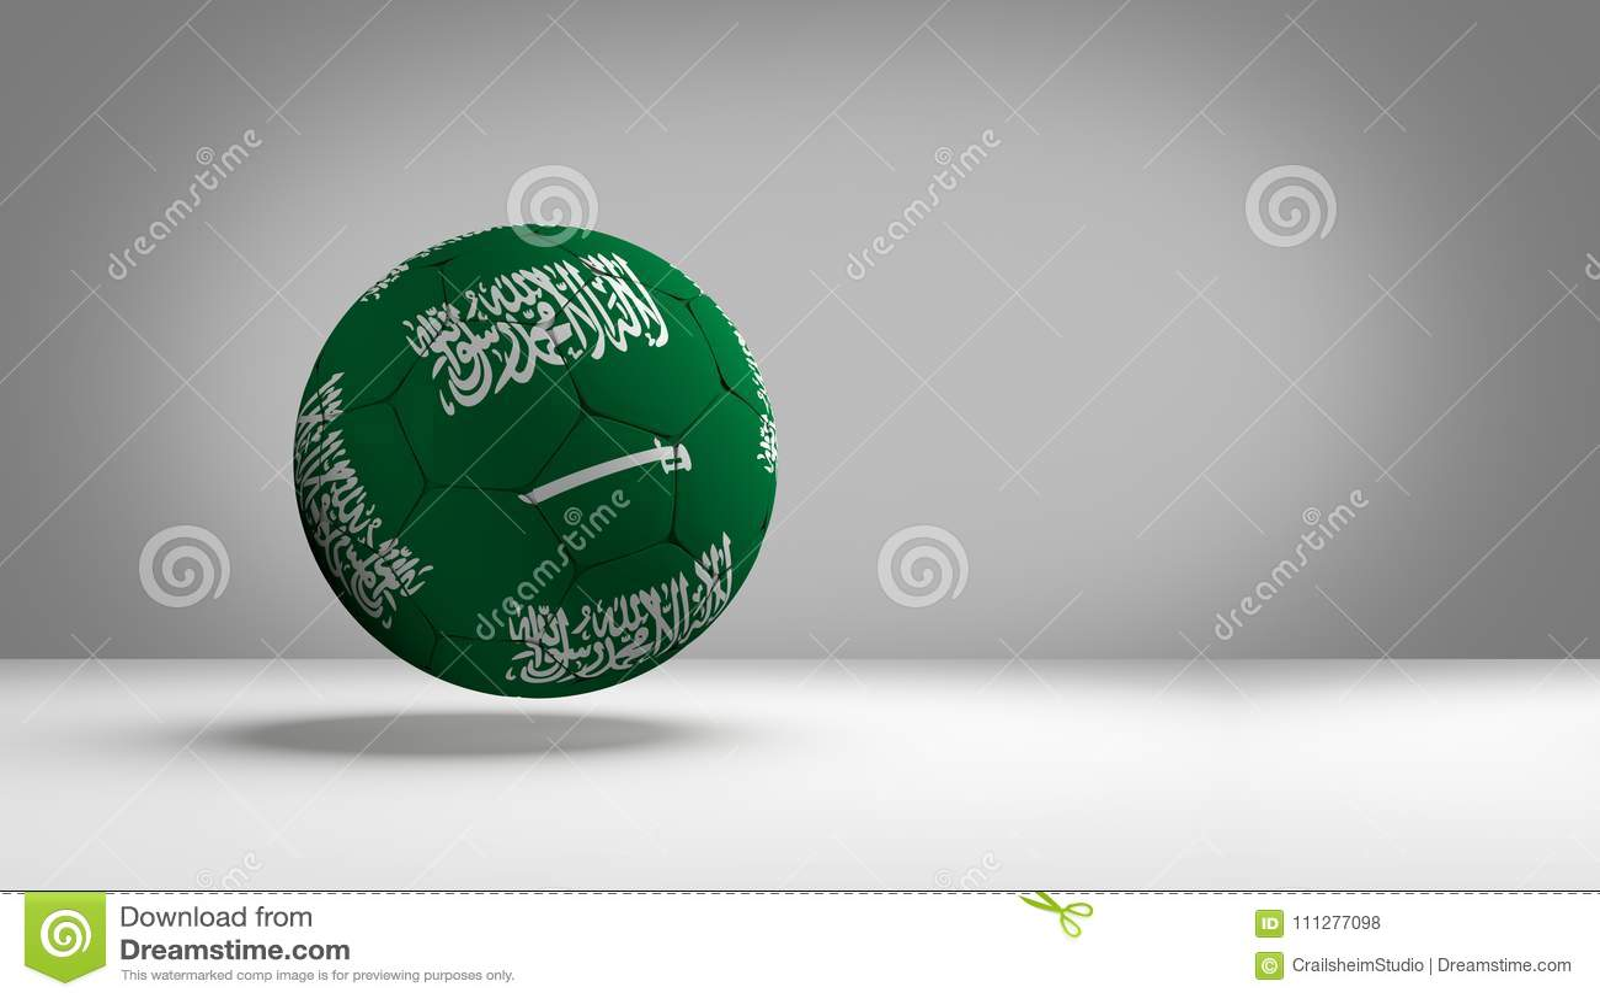 Saudi Arabia Soccer Football Ball 3d Rendering National Flag Color Design Image